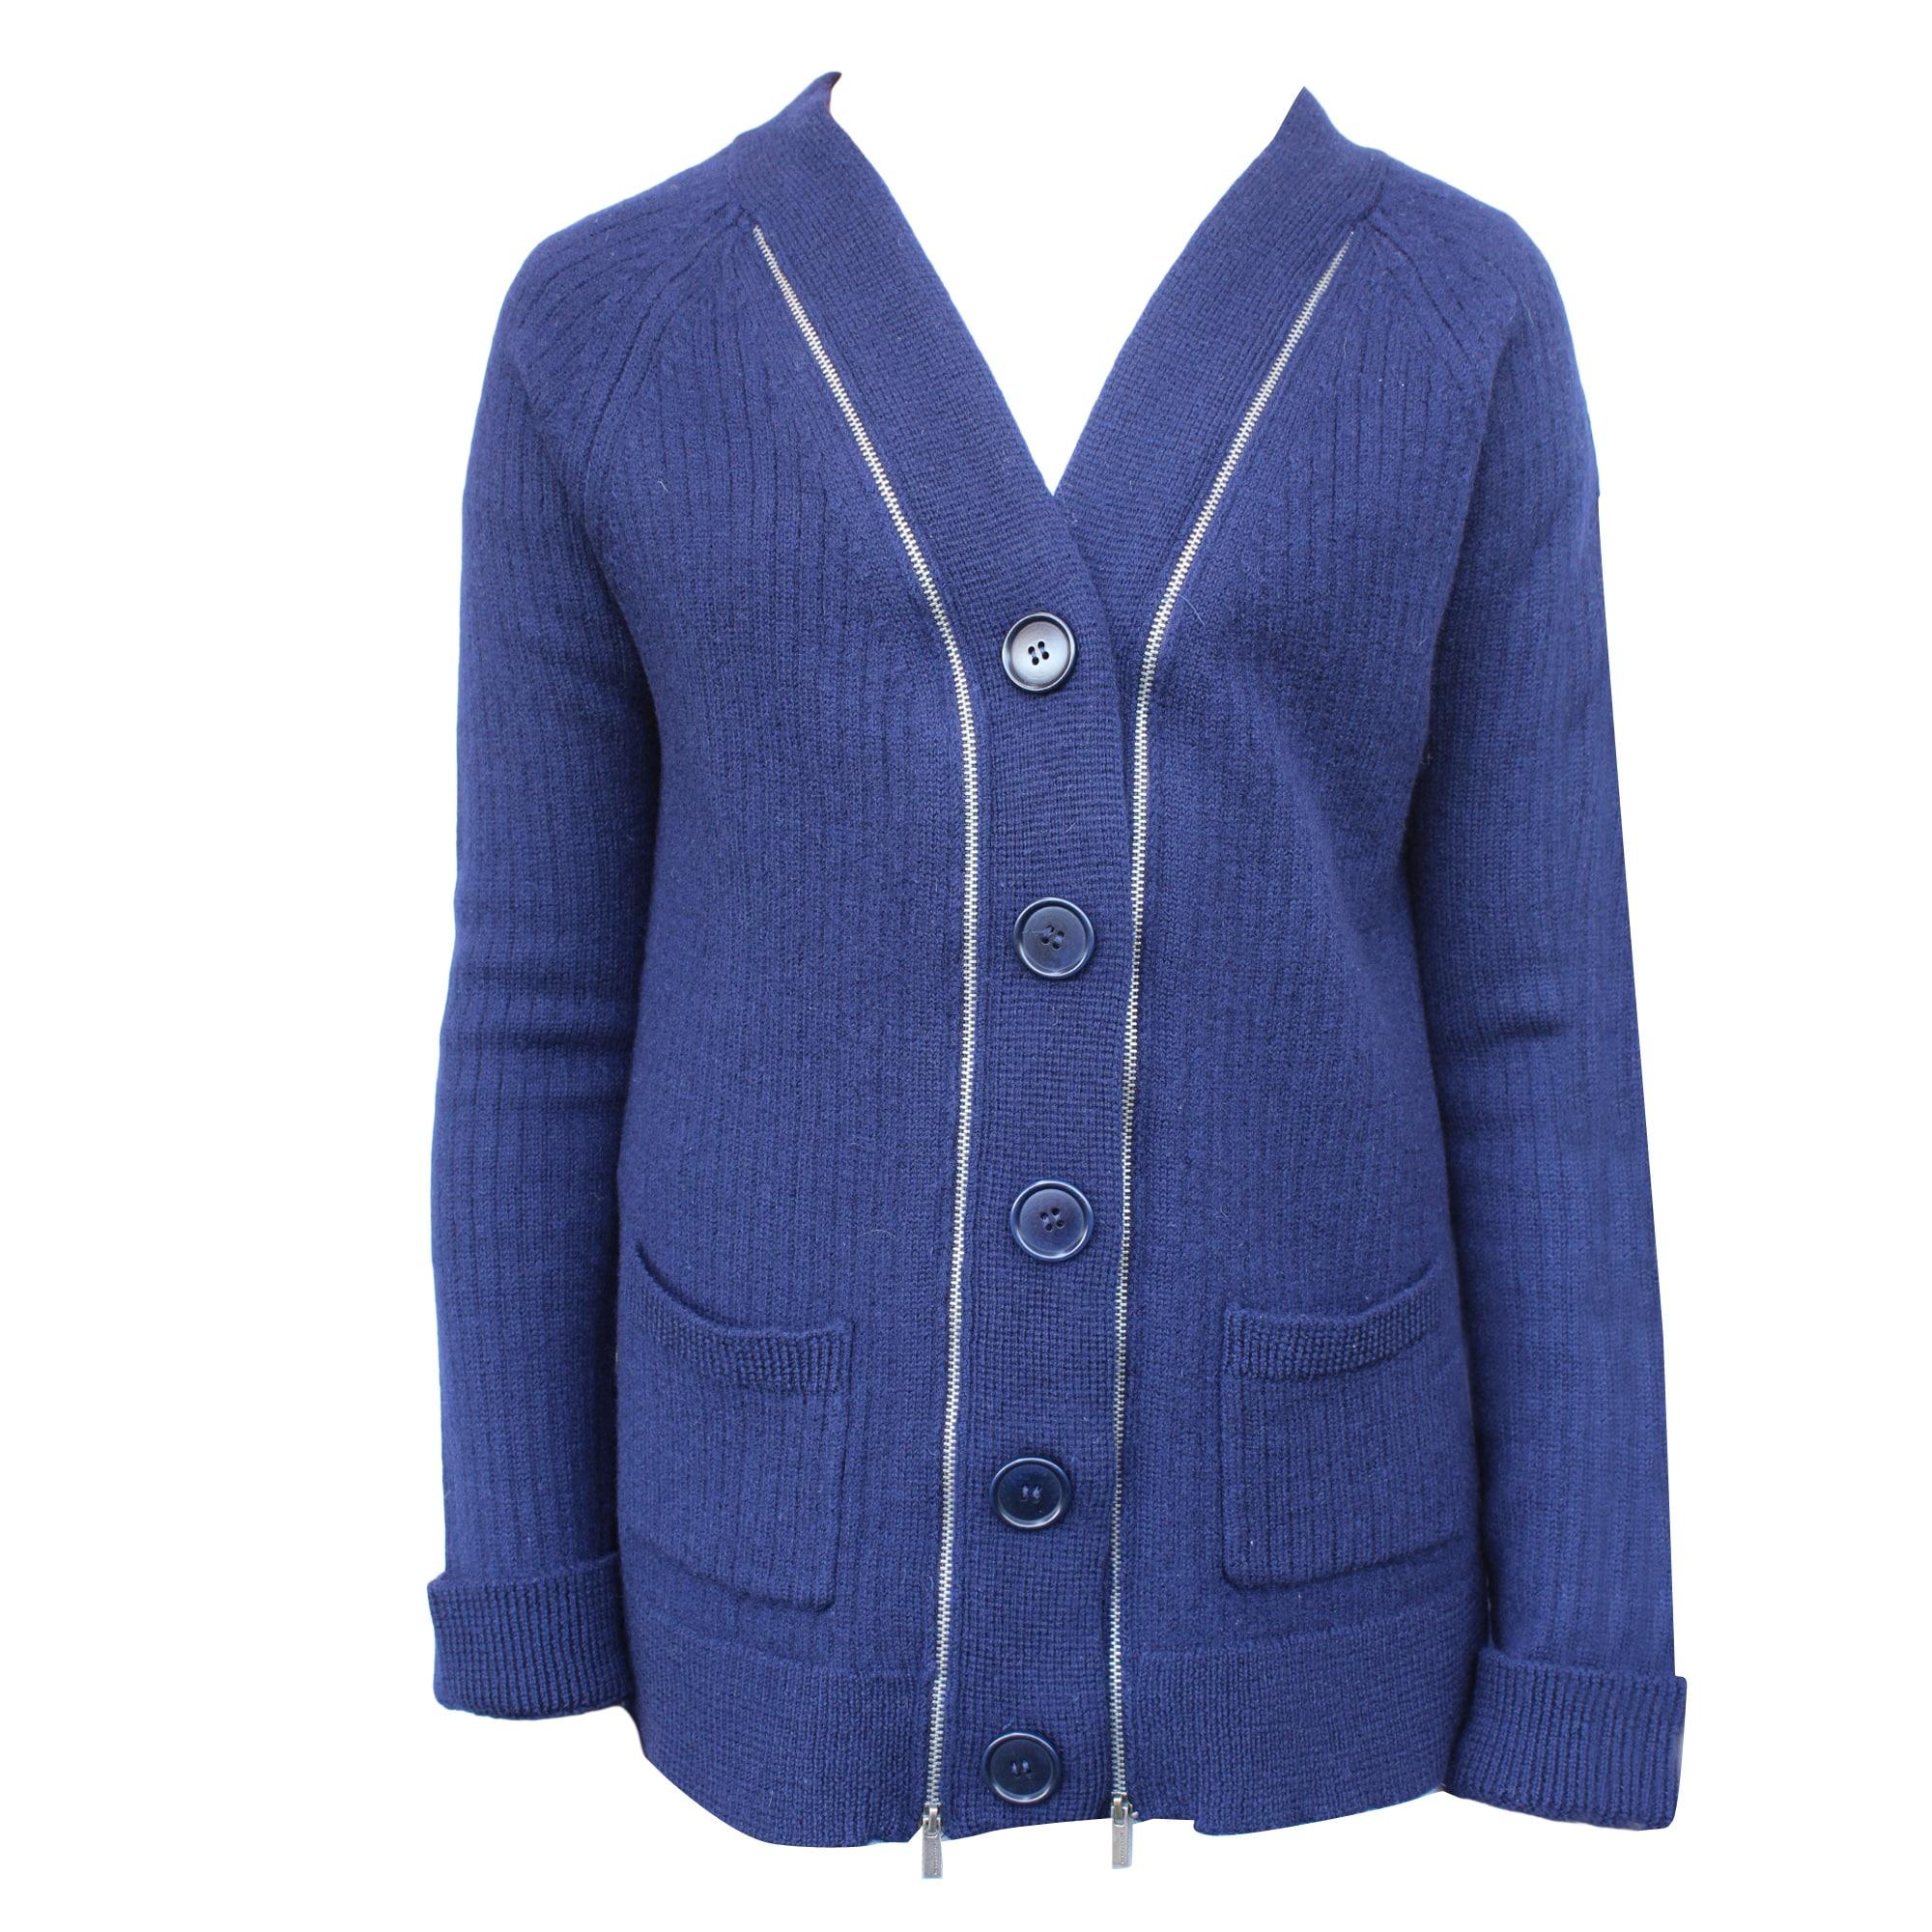 Gilet, cardigan BCBG MAX AZRIA Bleu, bleu marine, bleu turquoise